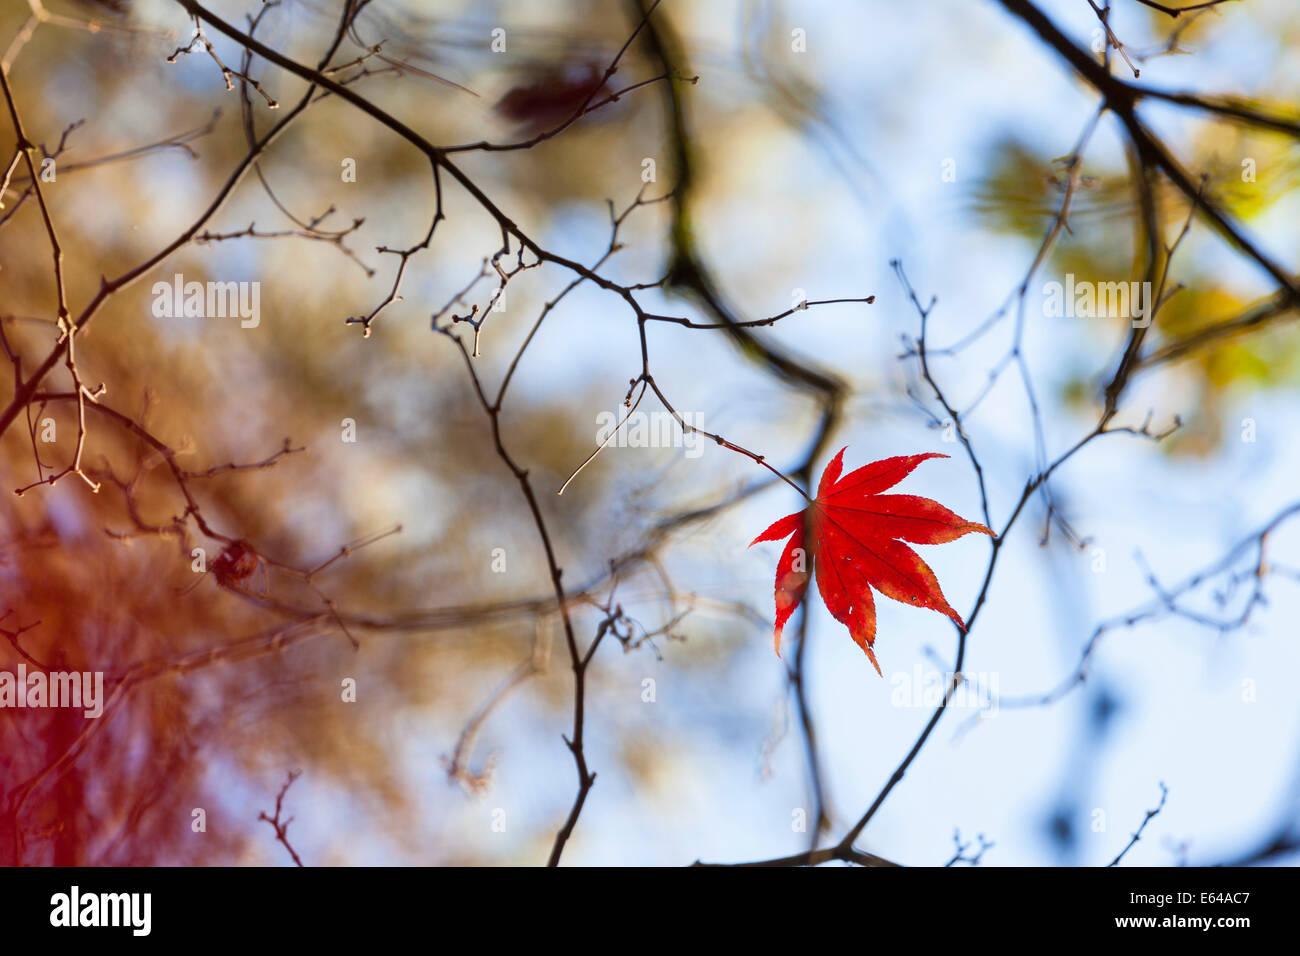 Autumn trees, Westonbirt Arboretum, Gloucestershire, UK - Stock Image